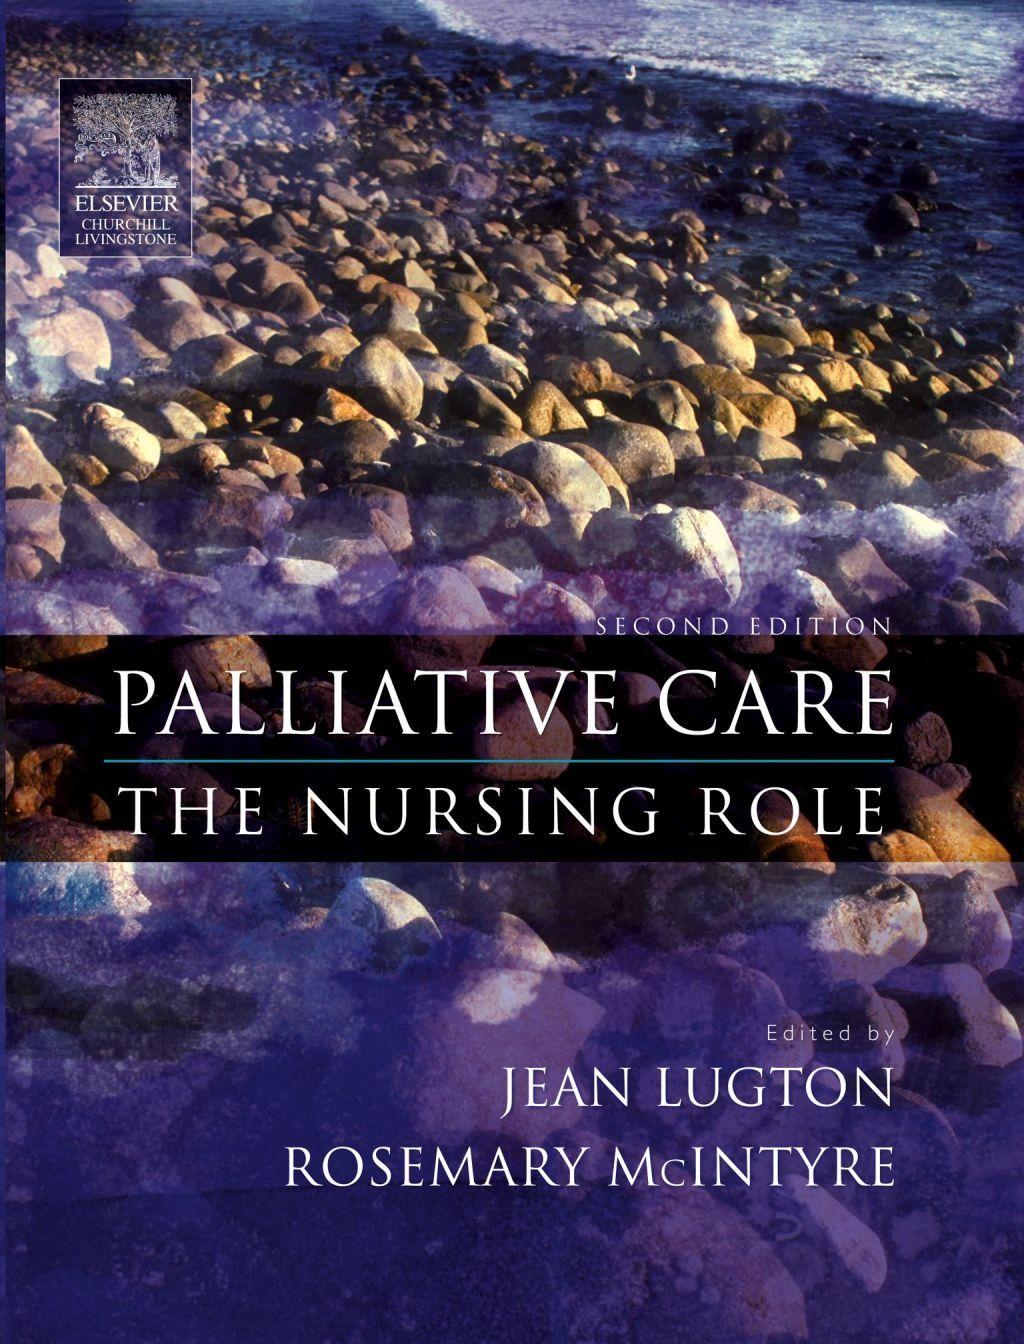 Palliative Care The Nursing Role (eBook) Library